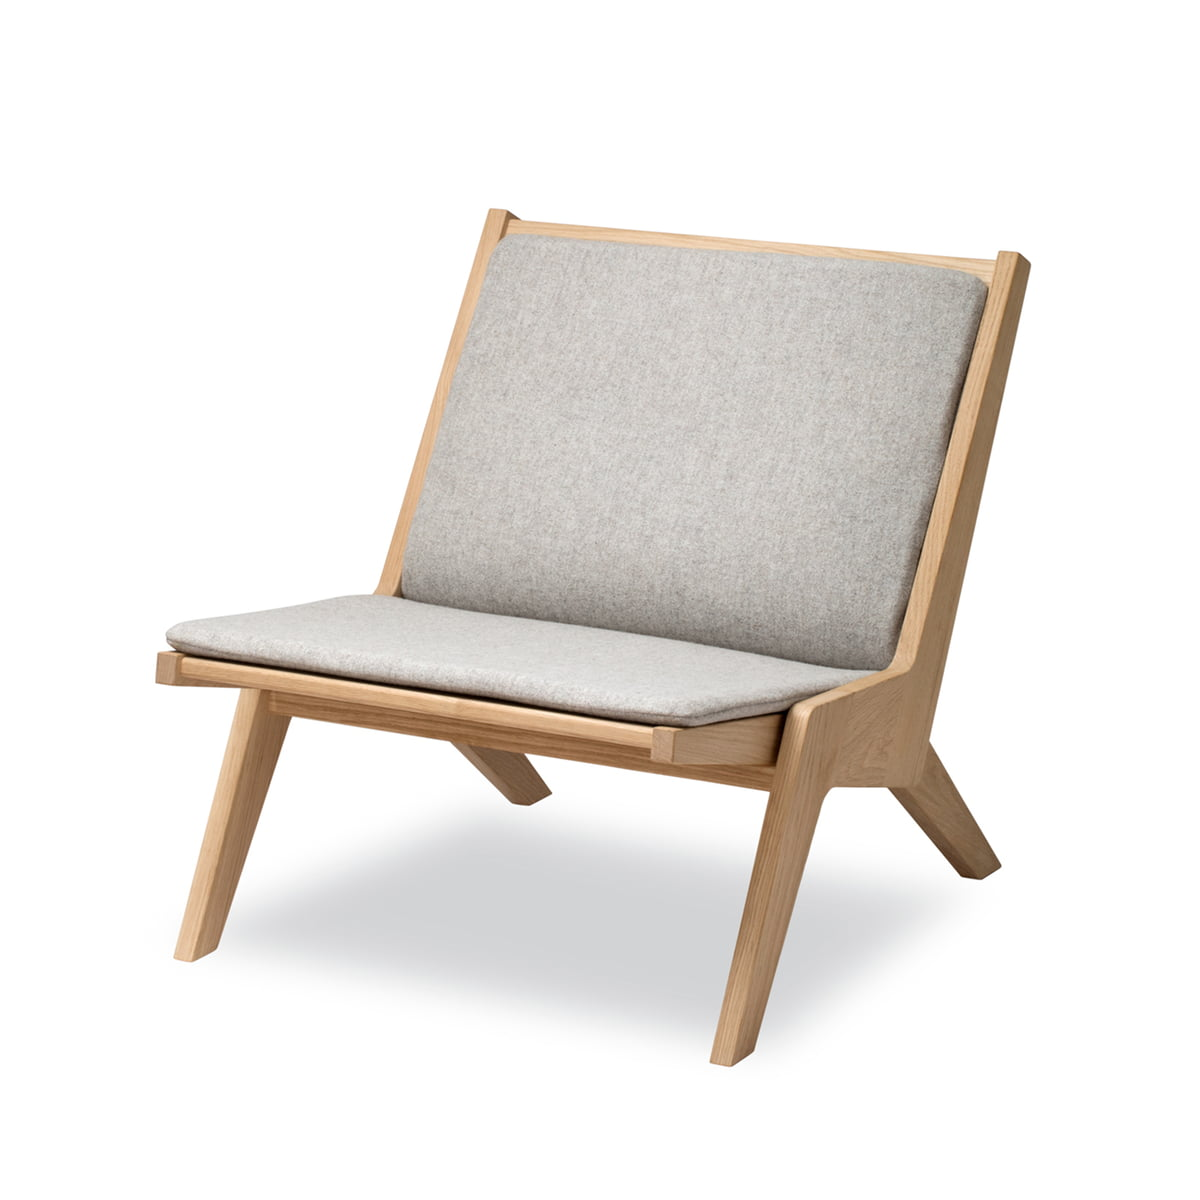 Skagerak - Miskito Lounge Chair in Oak / Light Grey